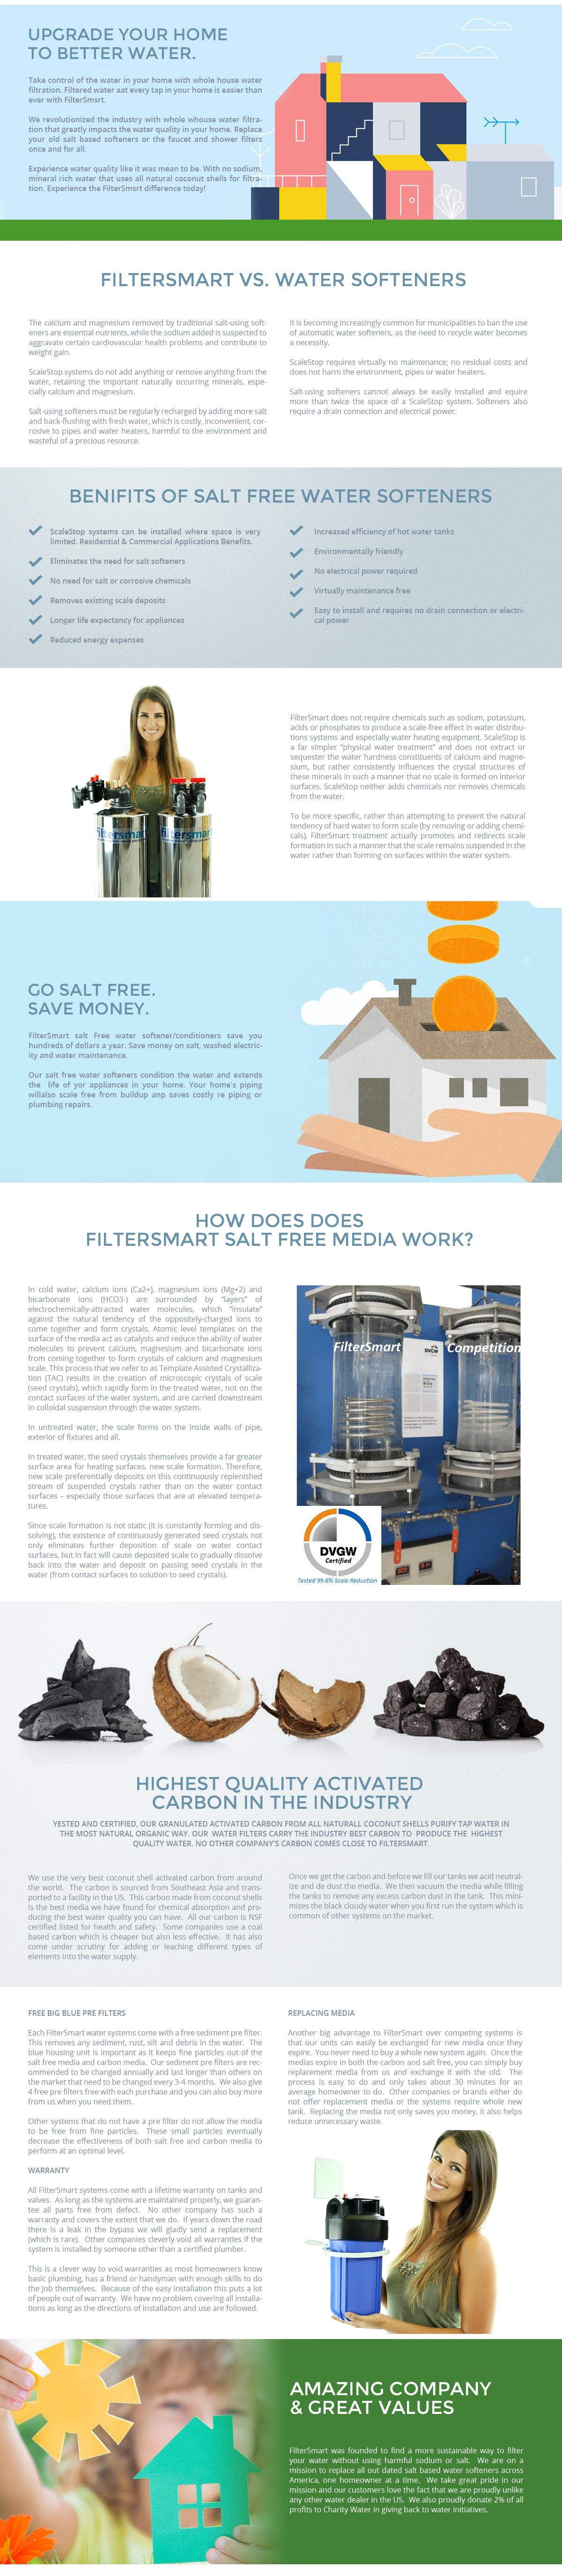 Filtersmart.com